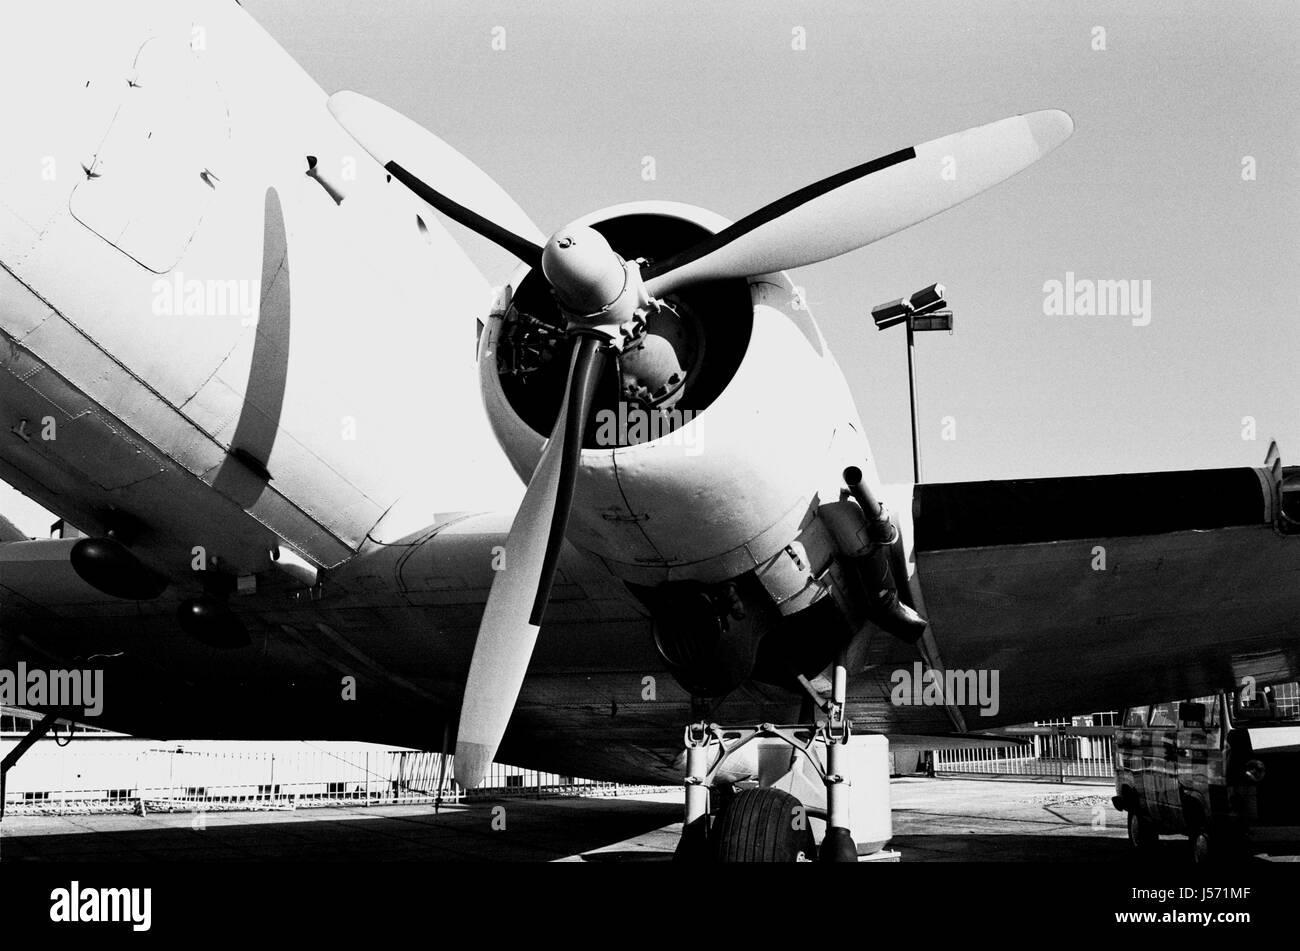 engine drive motor propeller old-timer aircraft aeroplane plane airplane dc 3 - Stock Image